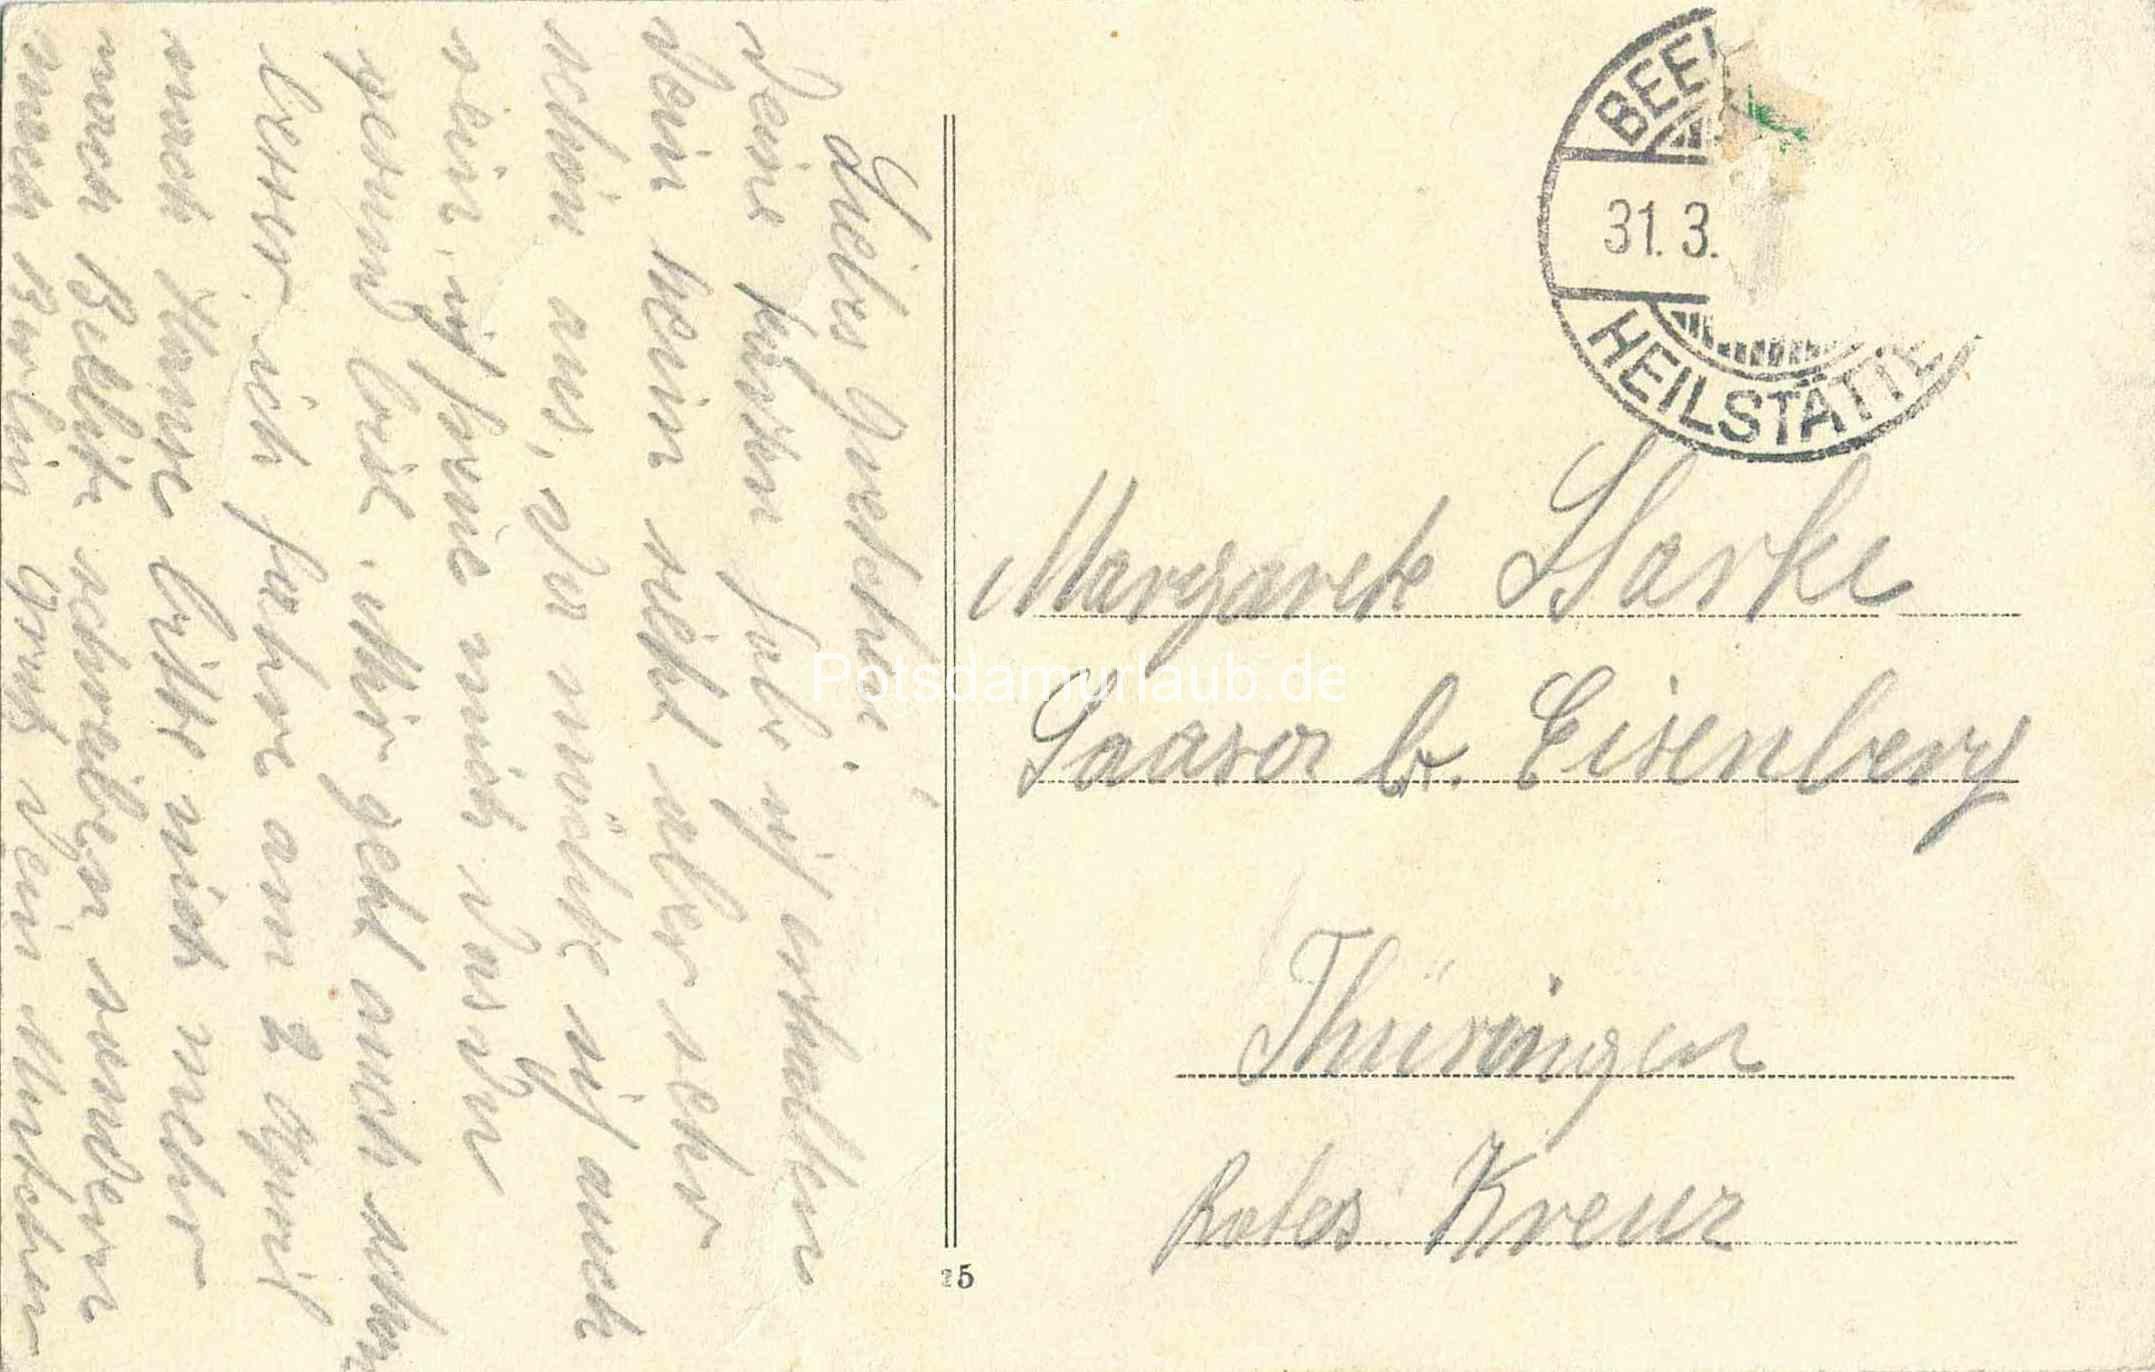 1909 03 31 r